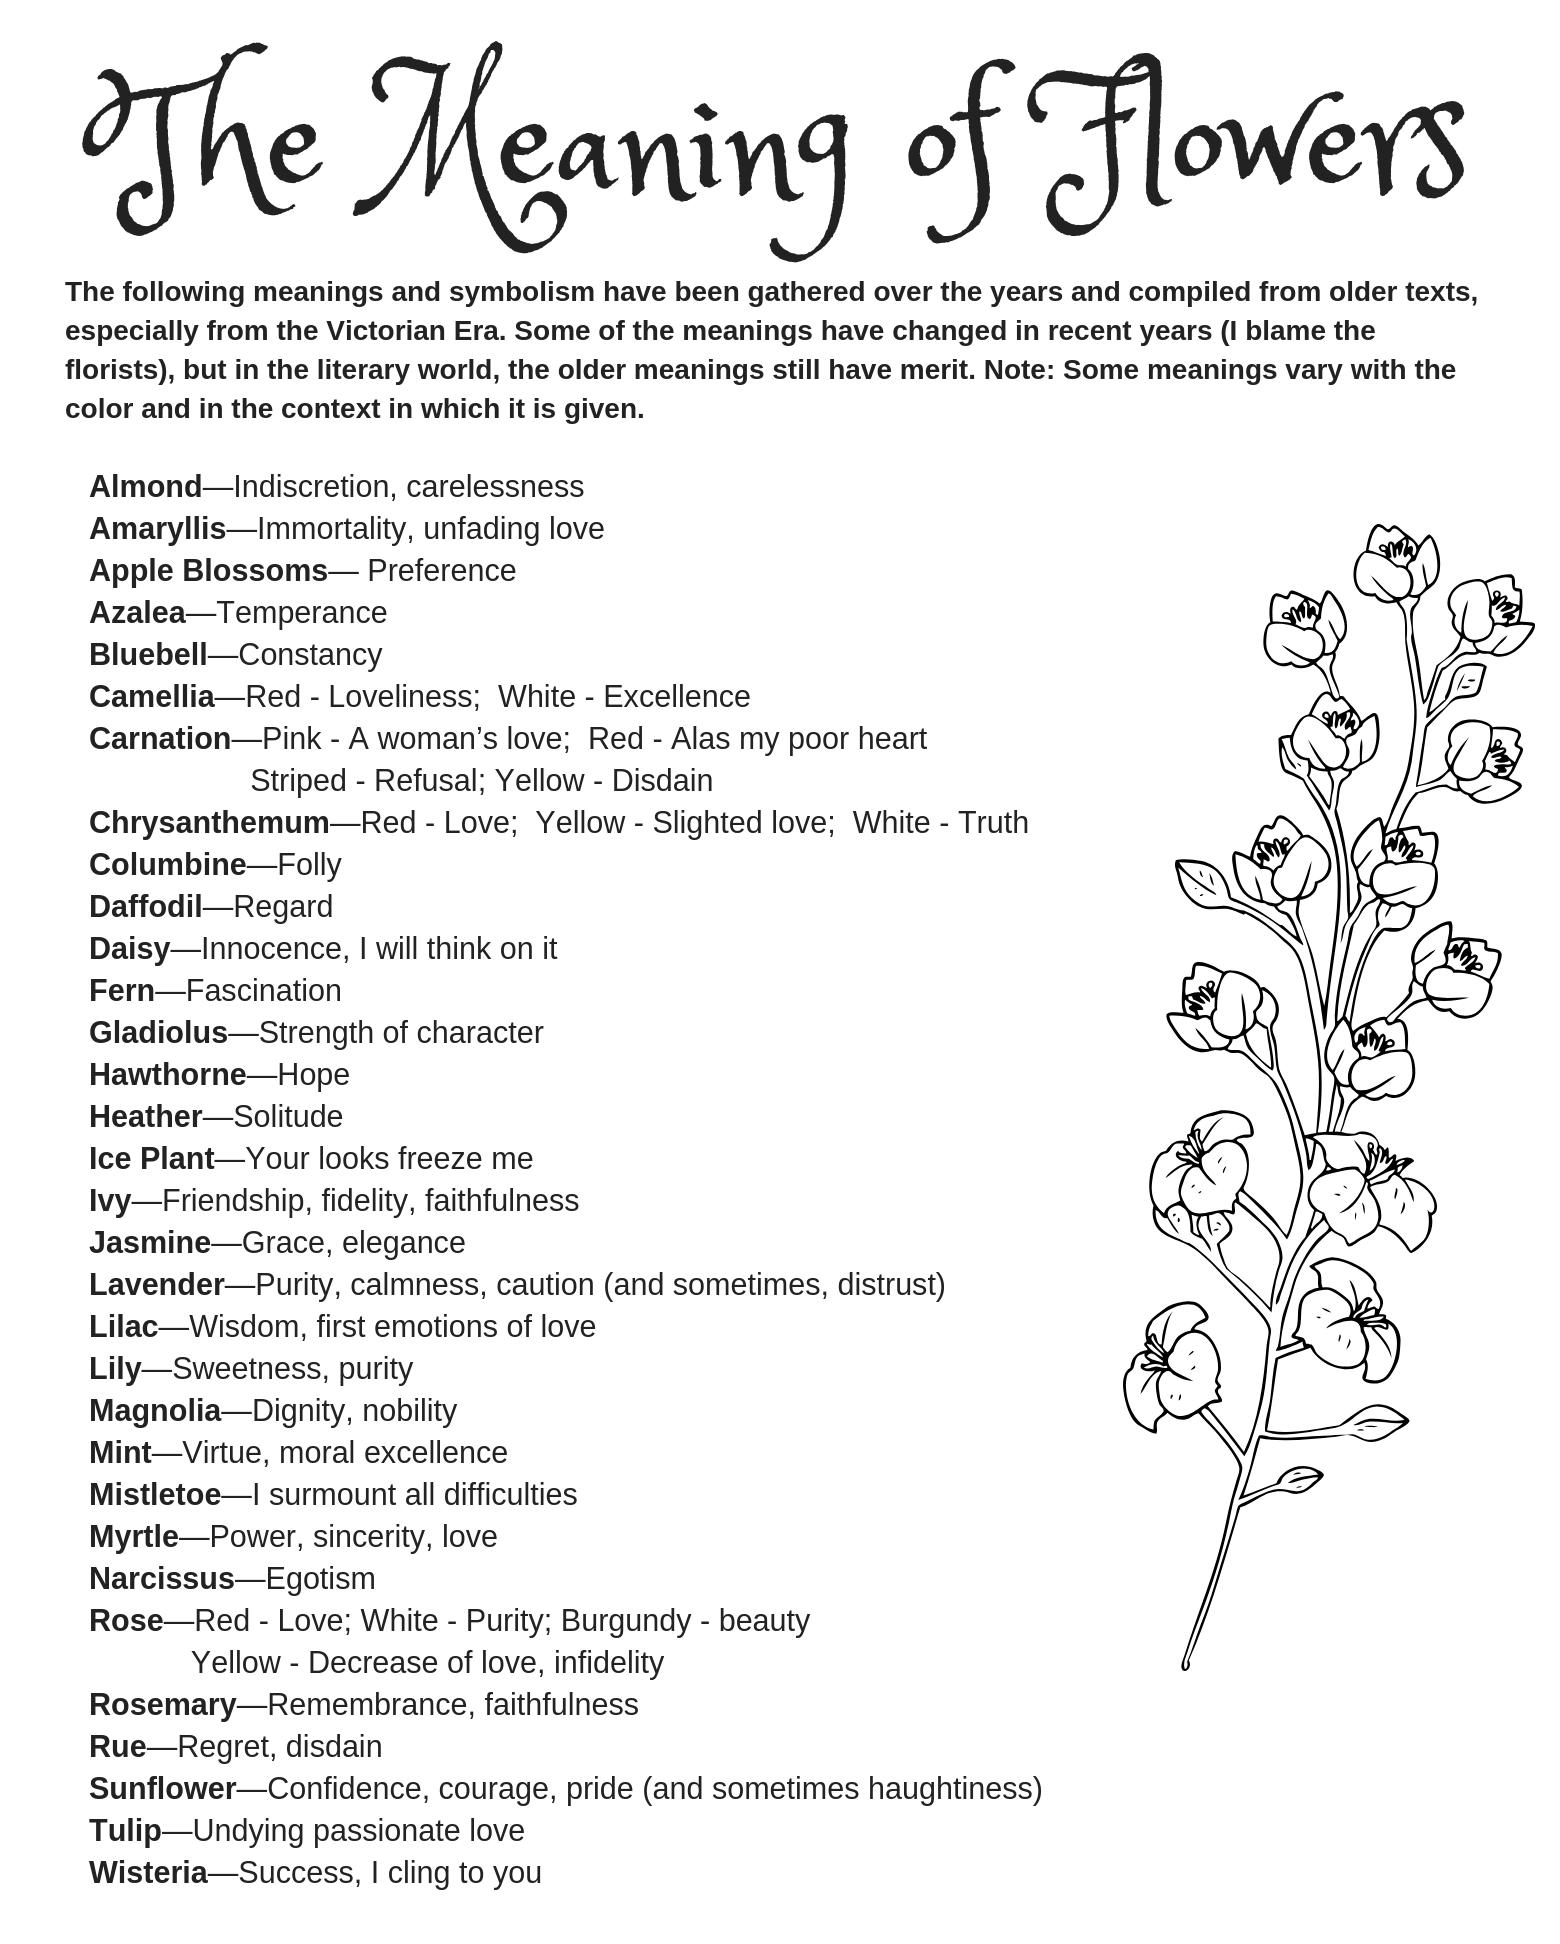 Symbolism of Flowers